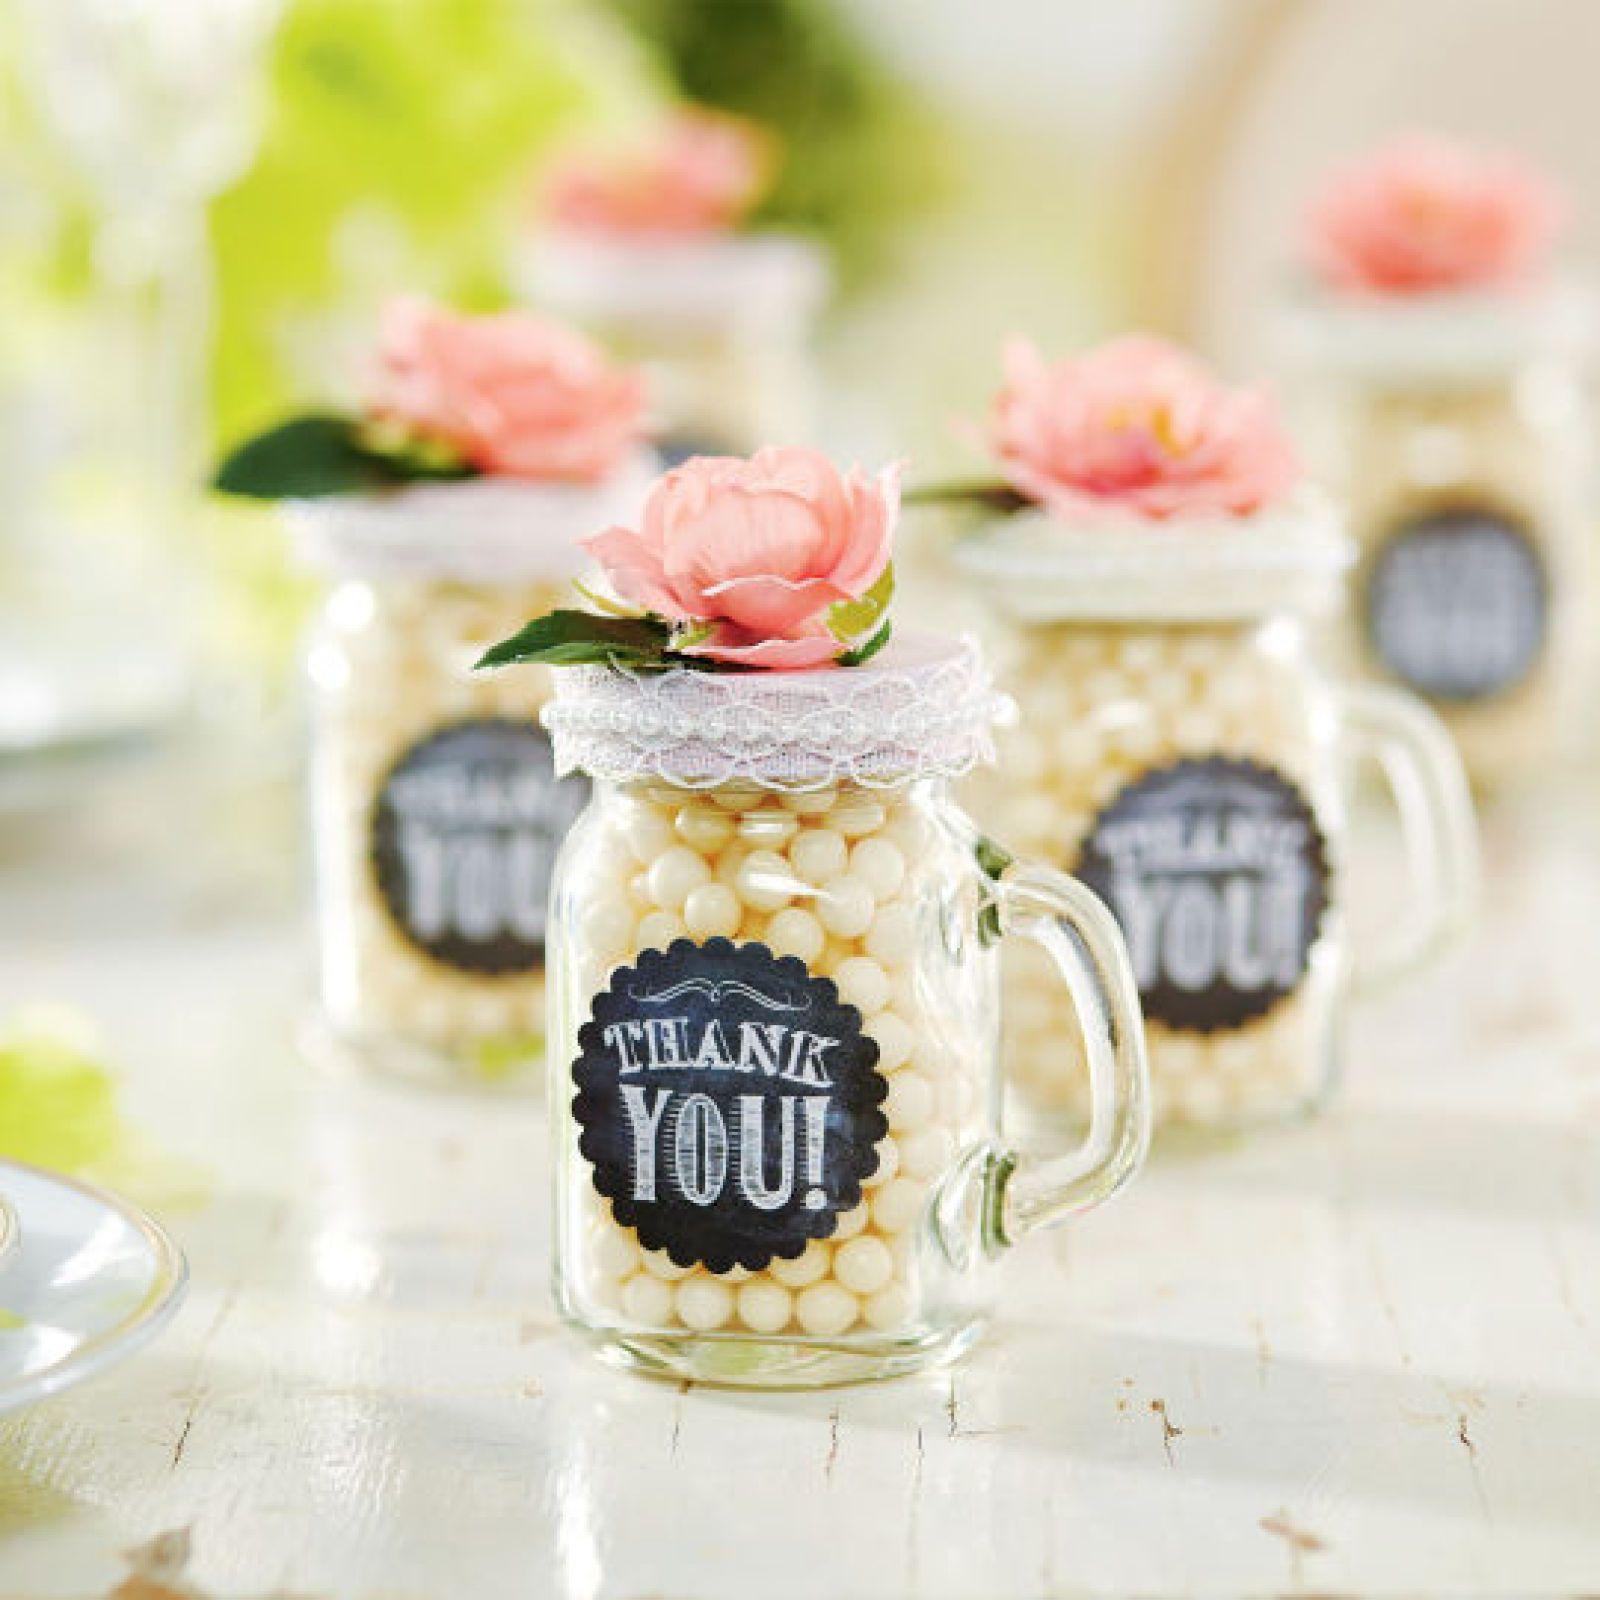 Mini Mason Jar Mug Favors  perfect for holiday gifts  Babyshower